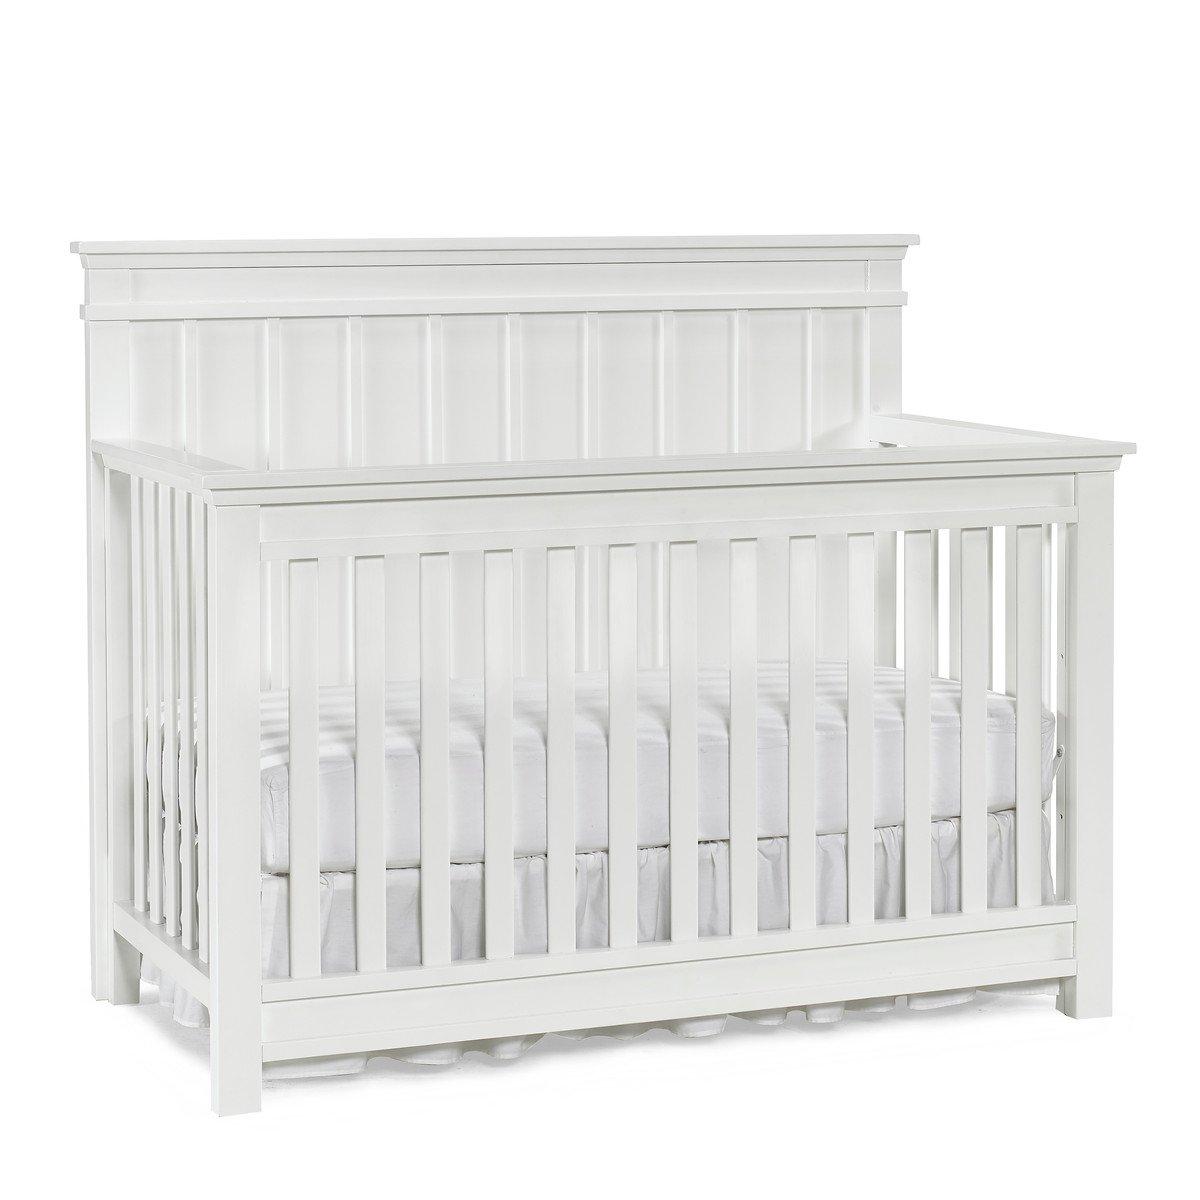 Dolce Babi | Bocca | Full Panel Convertible Crib